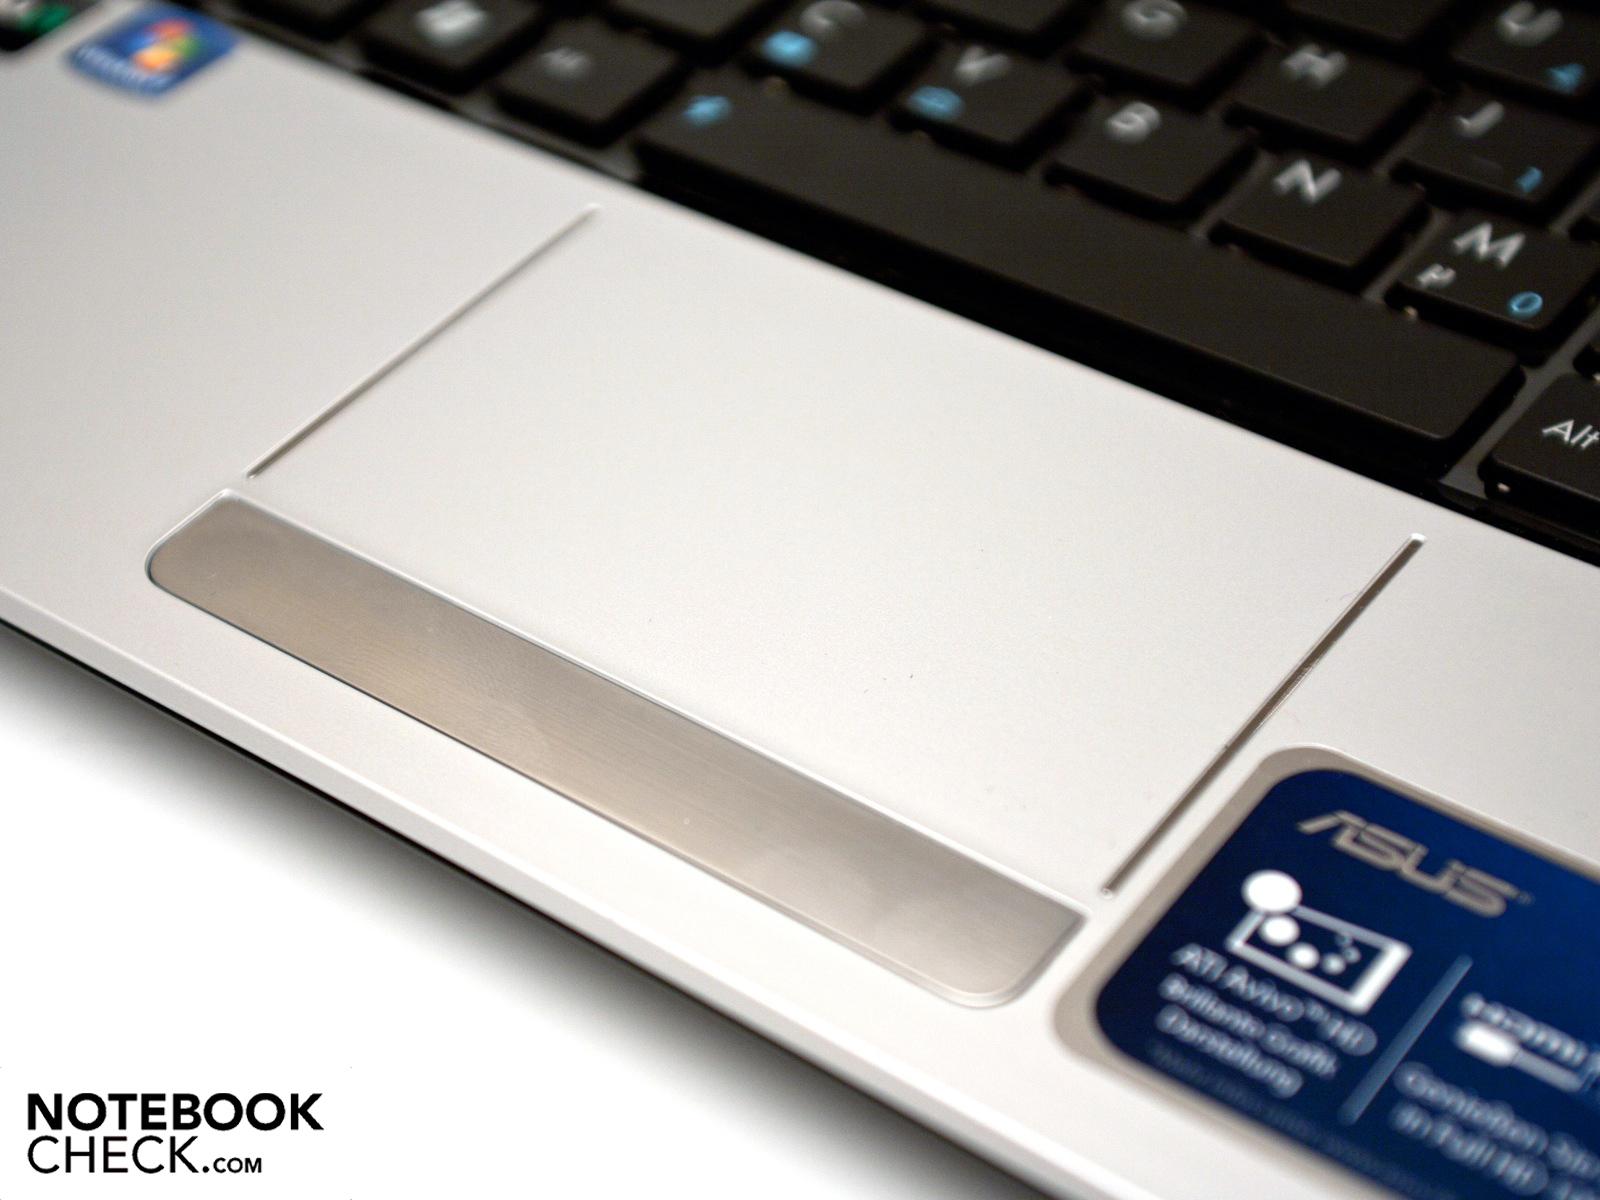 Замена тачпада на ноутбуке